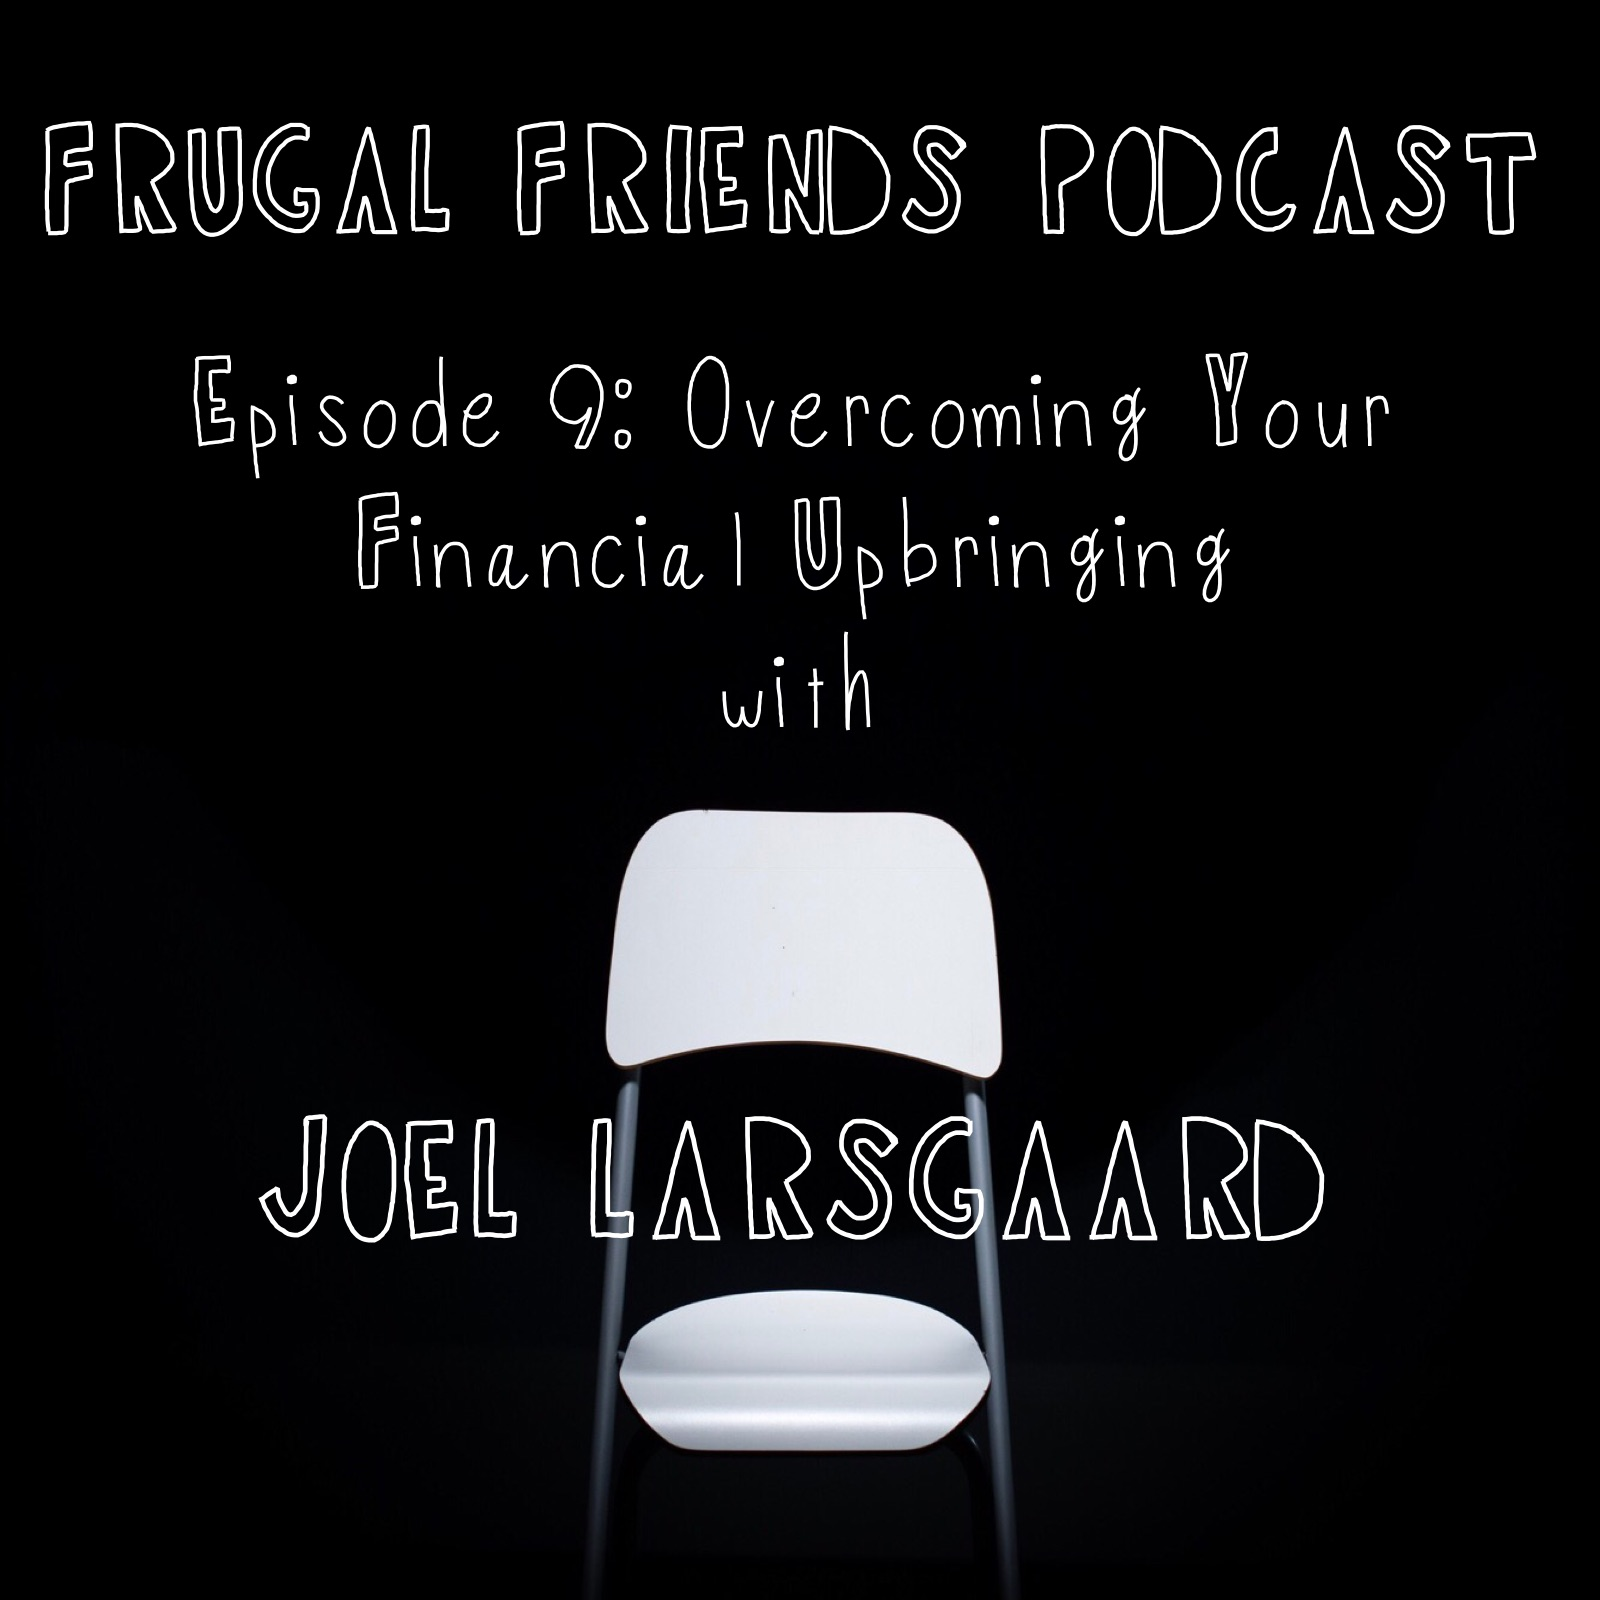 Episode 9: Overcoming Your Financial Upcoming with Joel Larsgaard